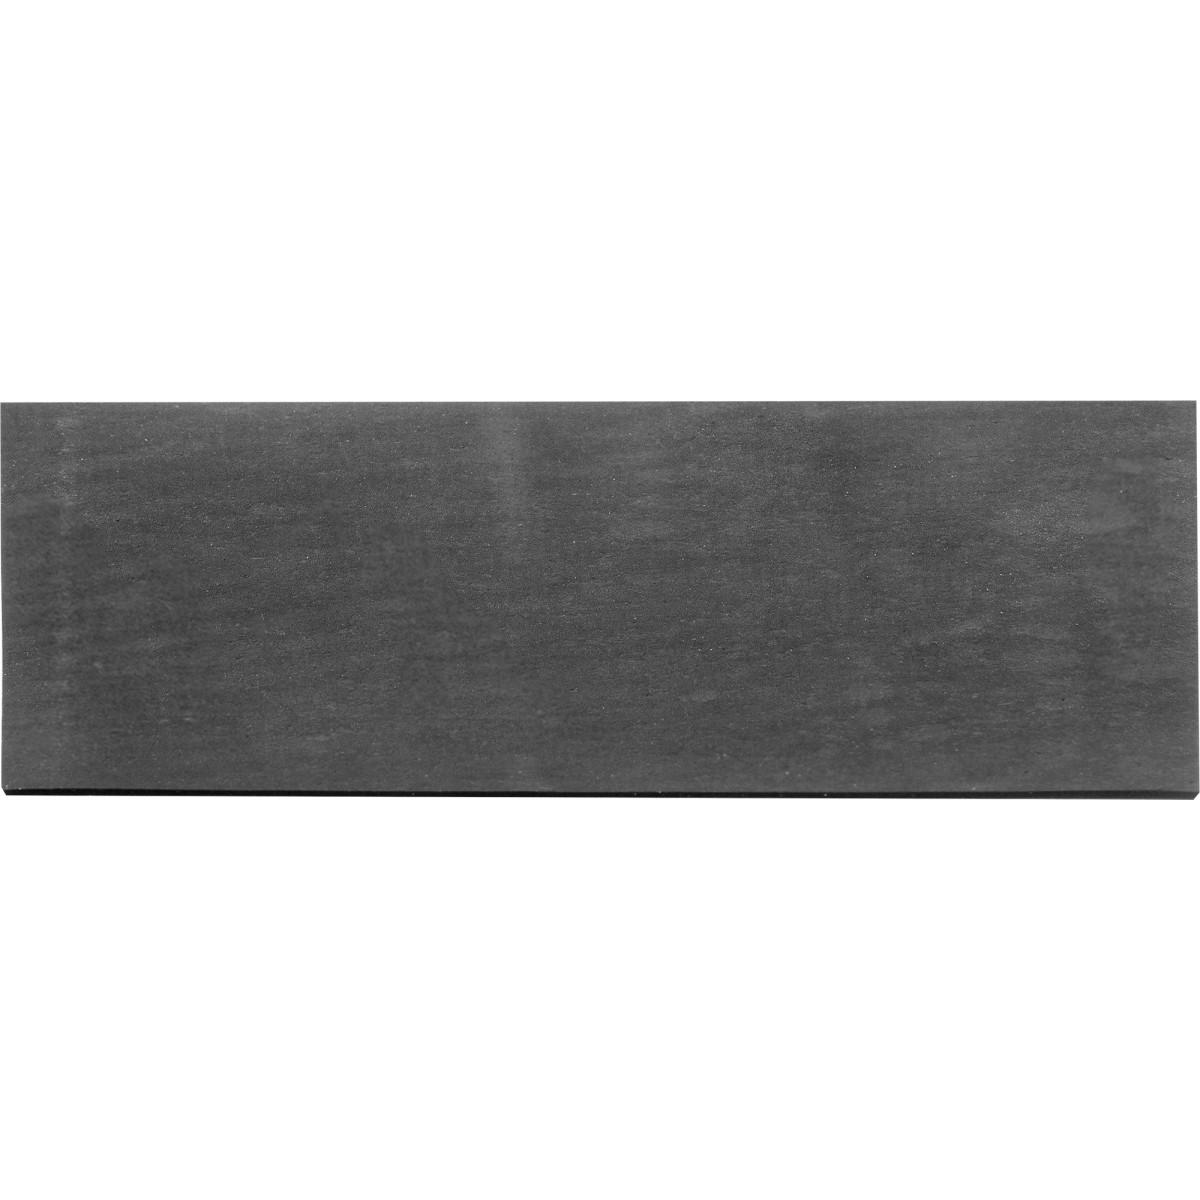 Резина листовая Equation 15x20 см резина